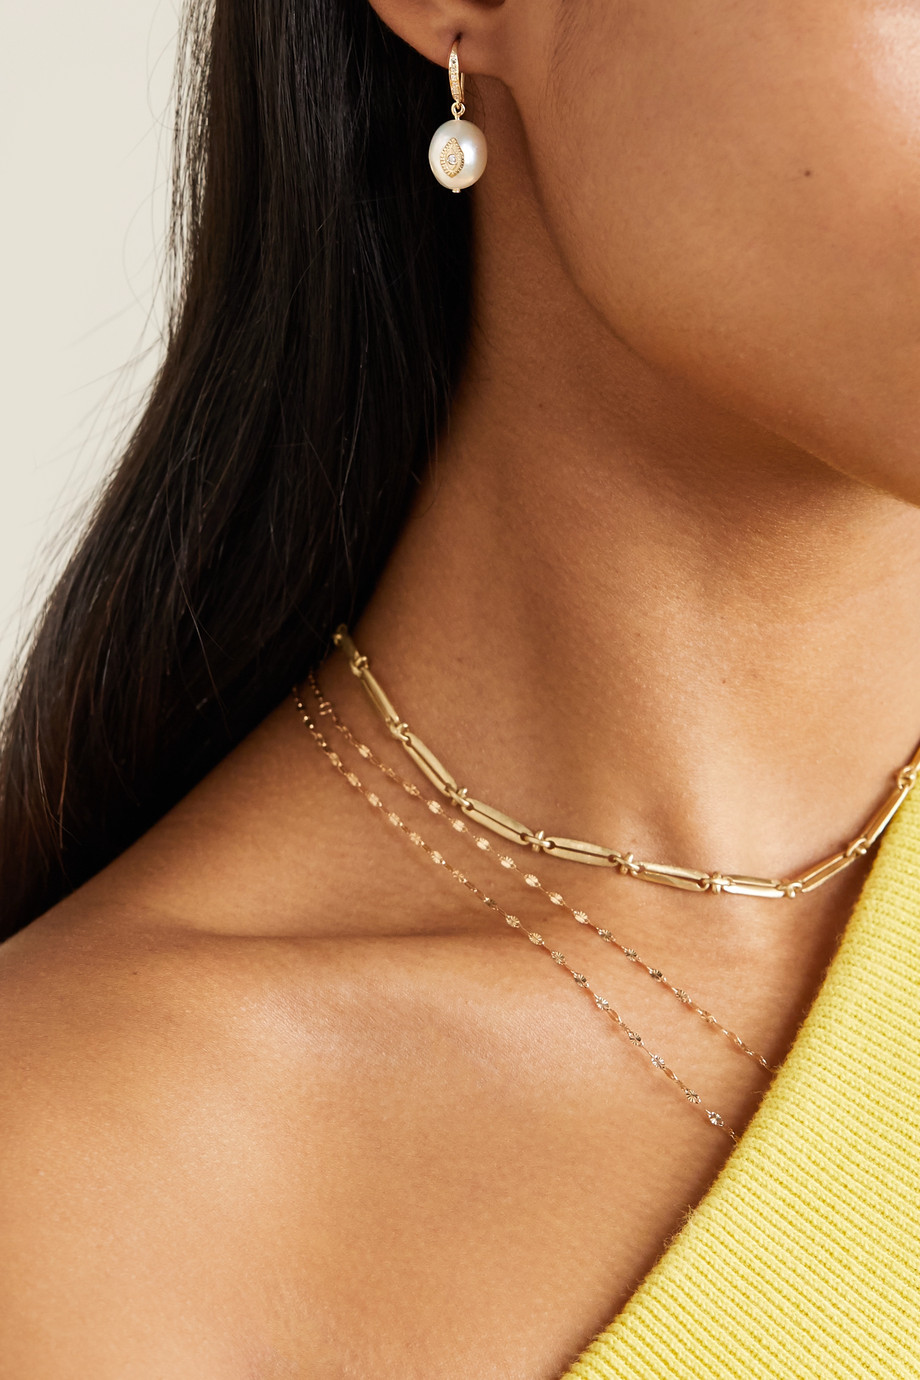 Pascale Monvoisin Charlie N°1 9-karat gold, pearl and diamond earring